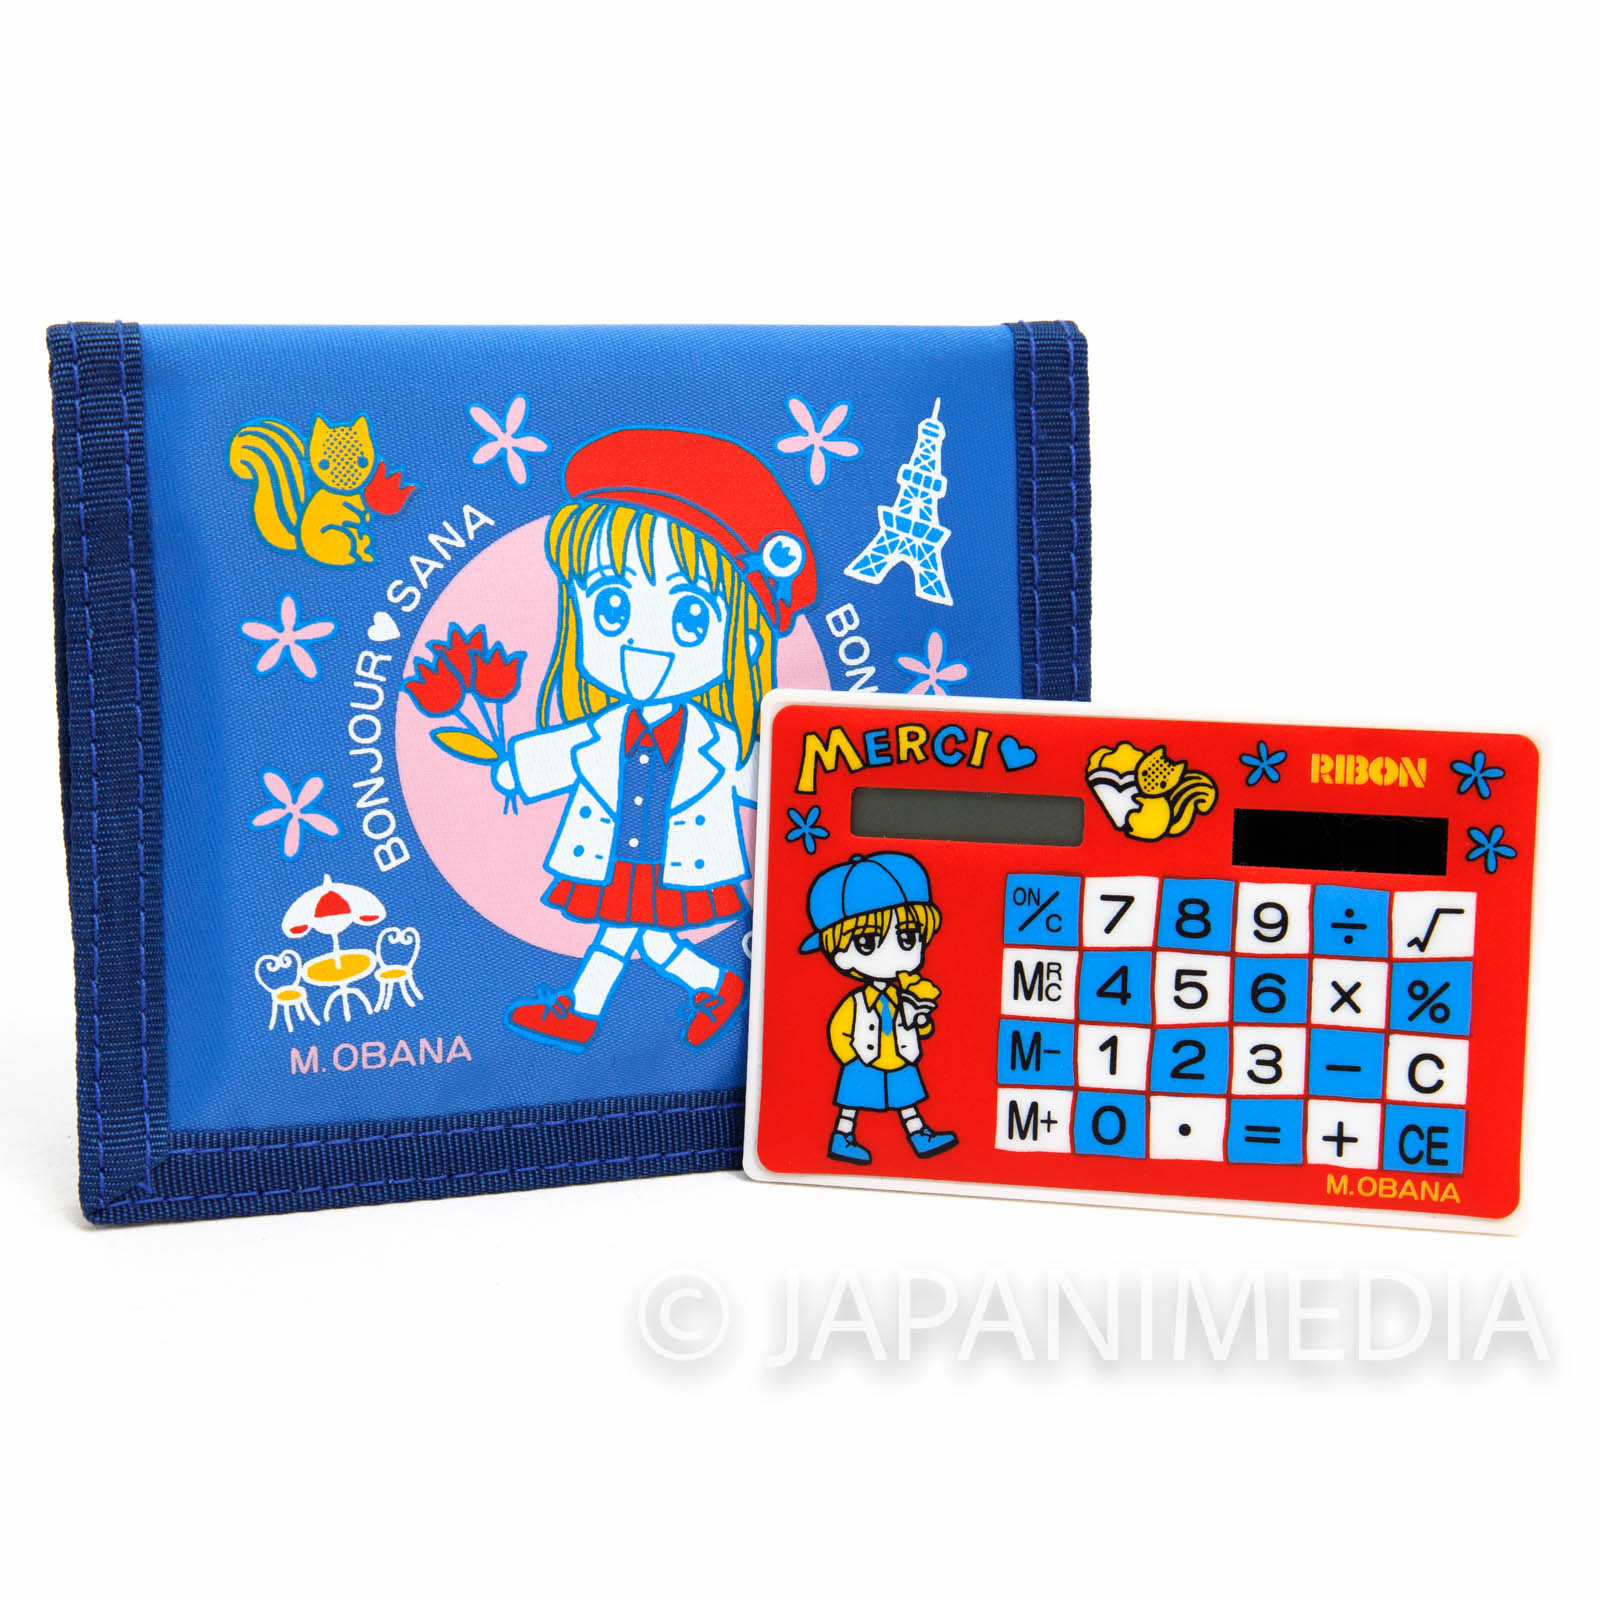 RARE!! Kodocha Sana Kurata Colorful Wallet with Calculator Ribon JAPAN MANGA